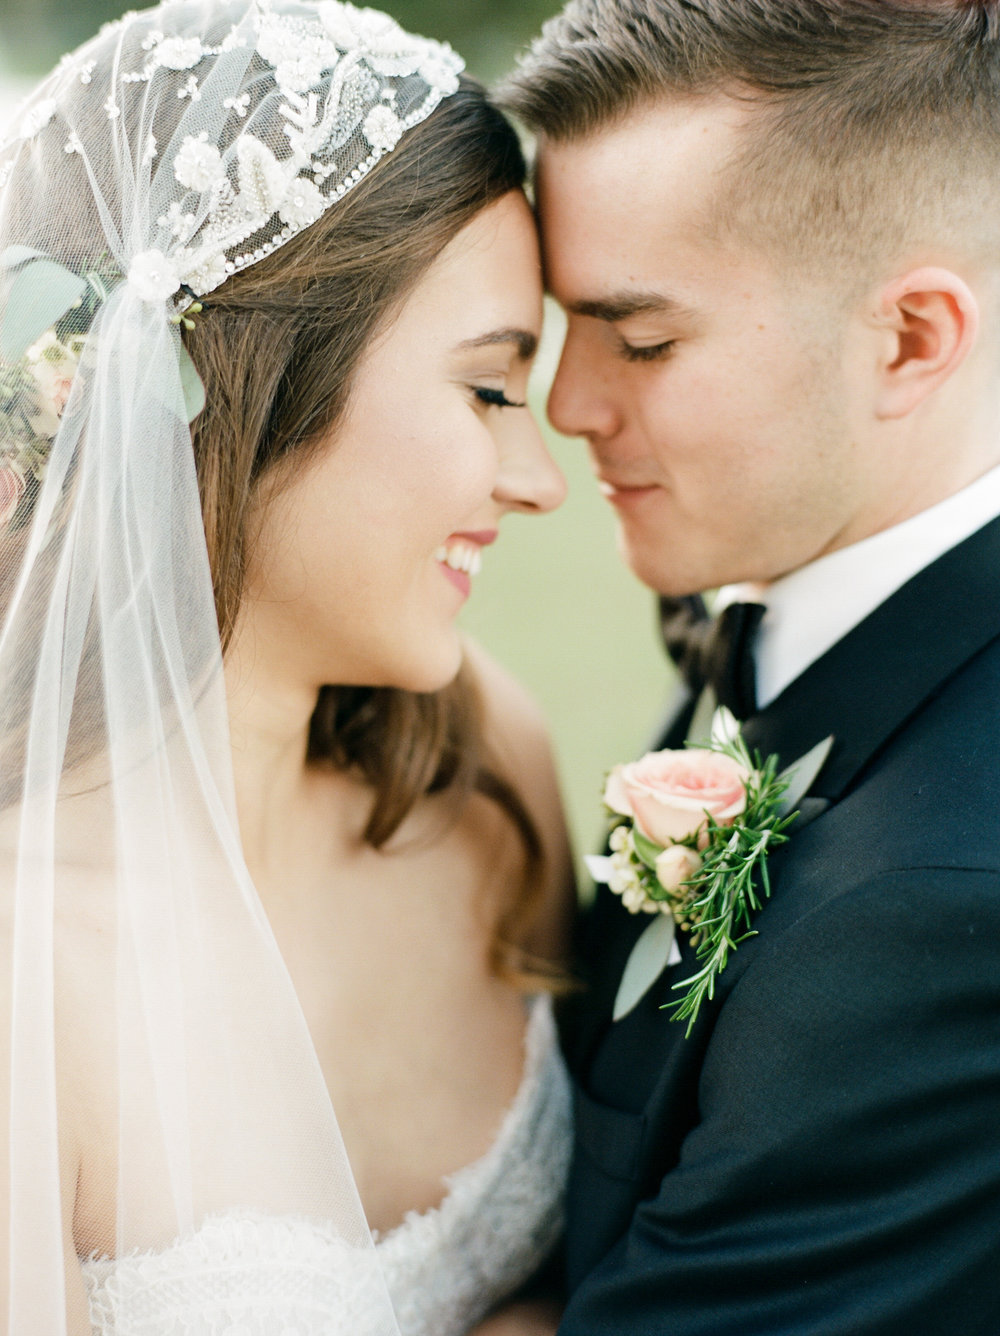 Top-Houston-Wedding-Photographer-Dana-Fernandez-Photography-The-Clubs-At-Houston-Oaks-Country-Club-Belle-Events-Film-Fine-Art-Destination-9.jpg